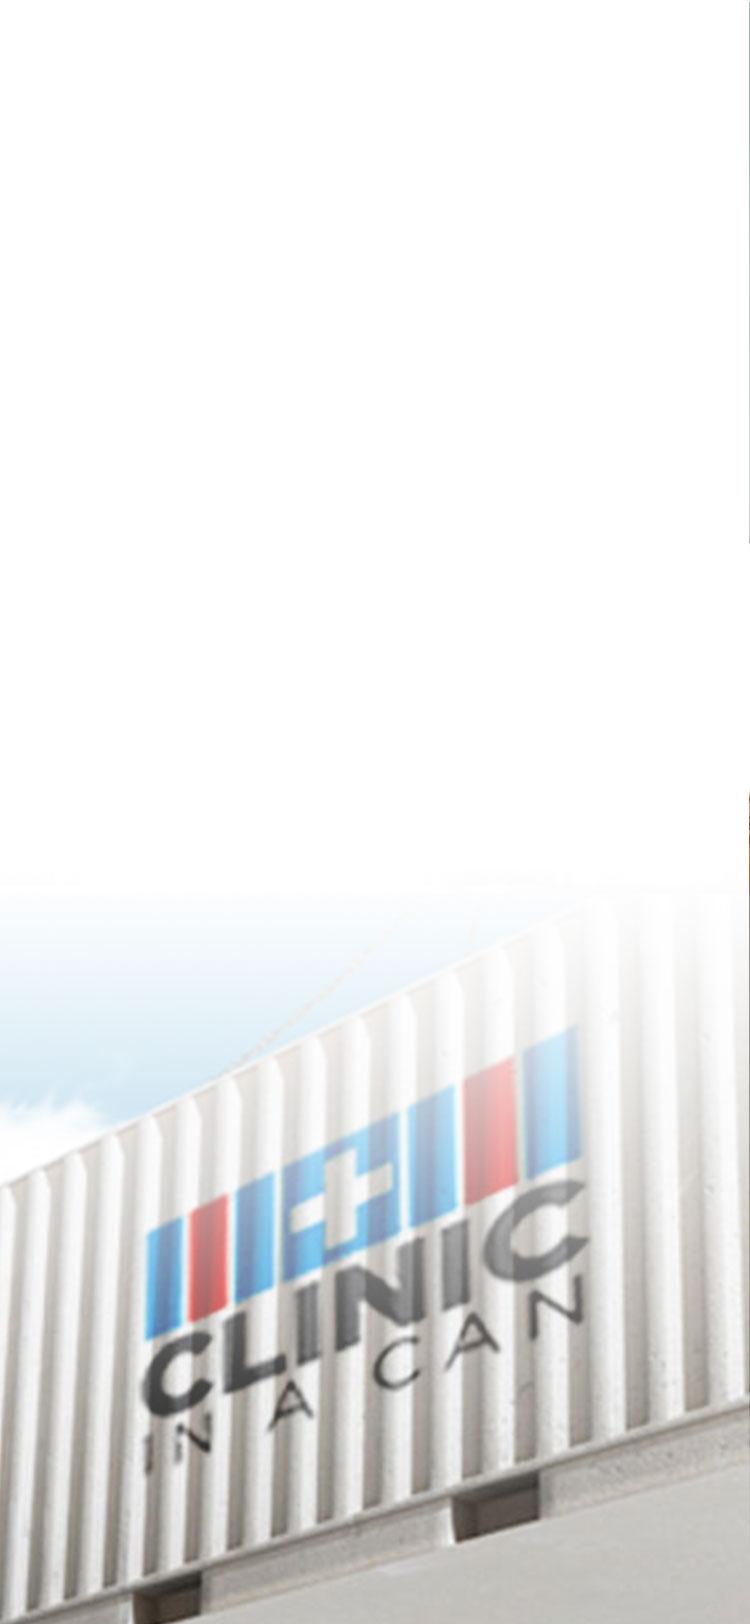 Clinicinacan-banner2